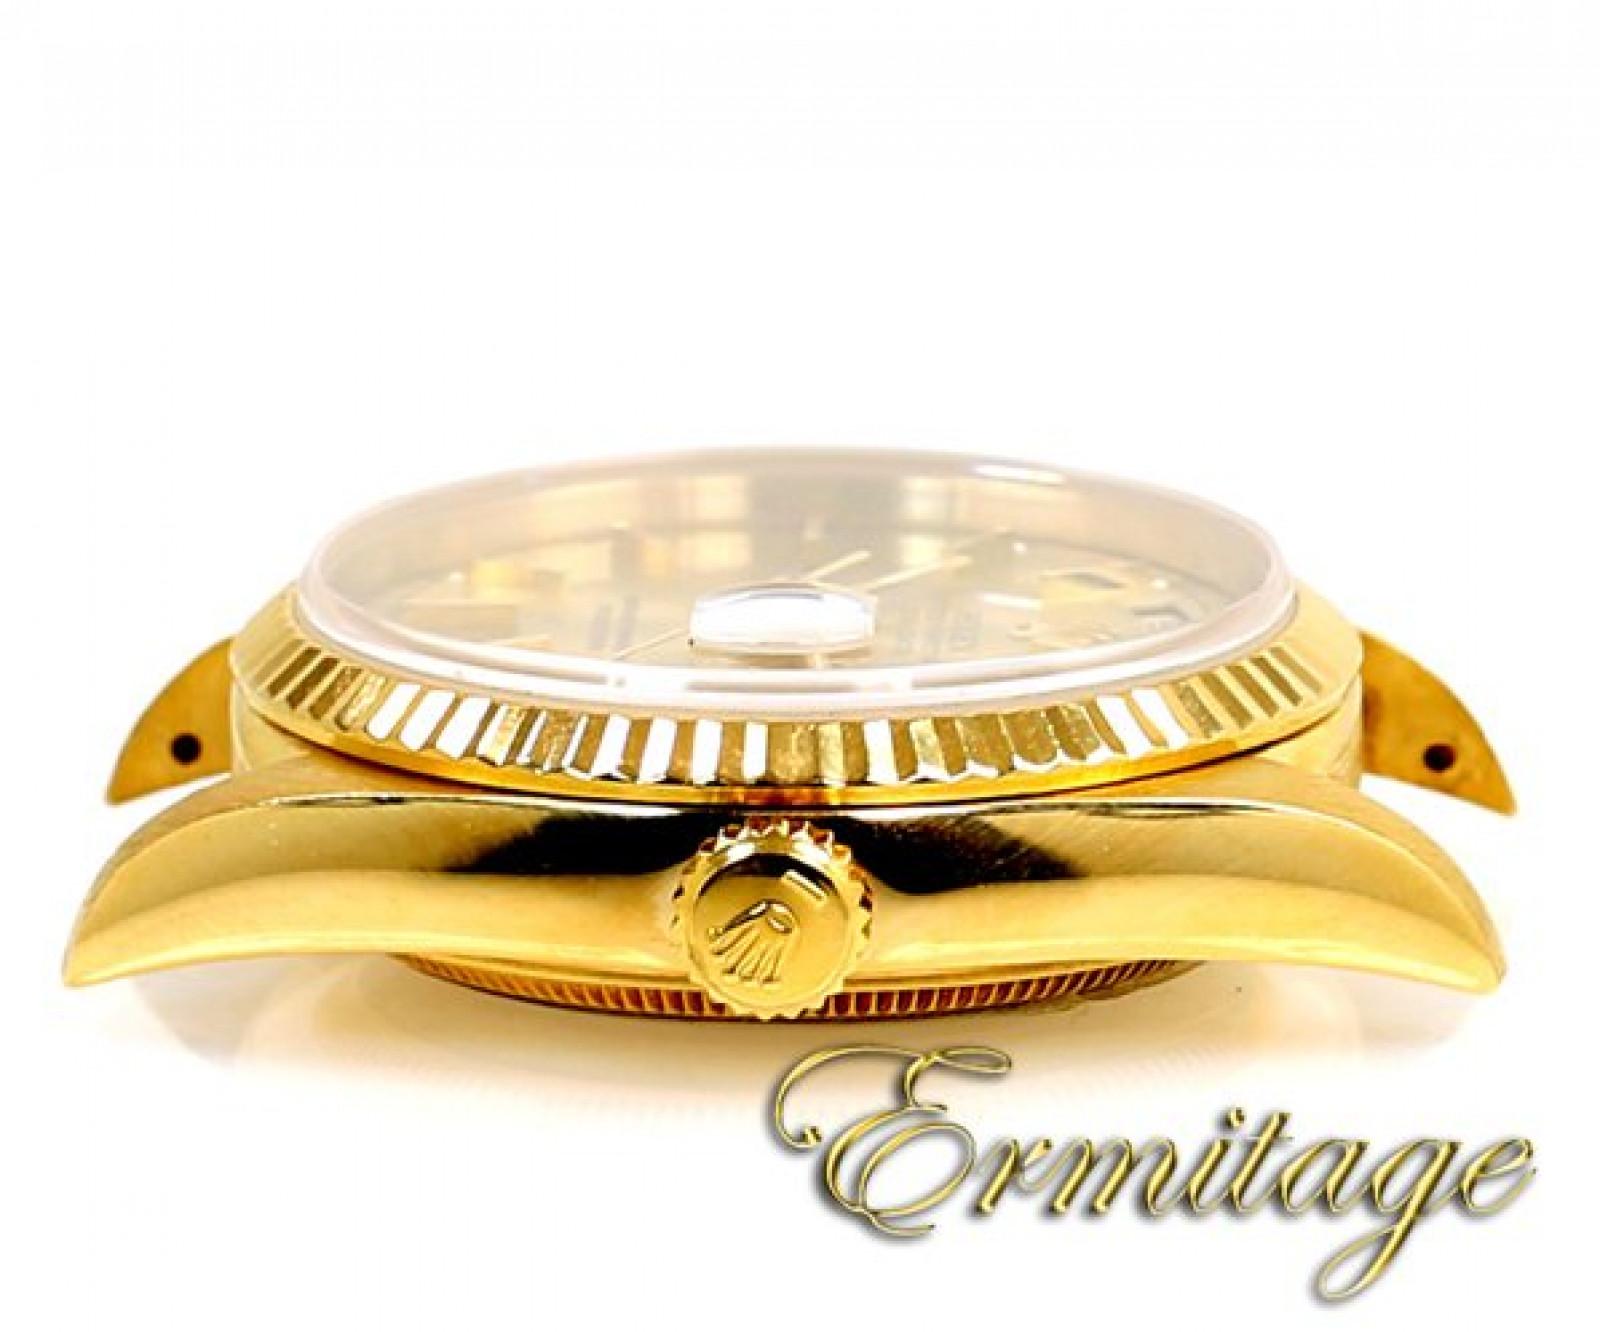 Rolex Day-Date 18238 Gold Champagne 1996